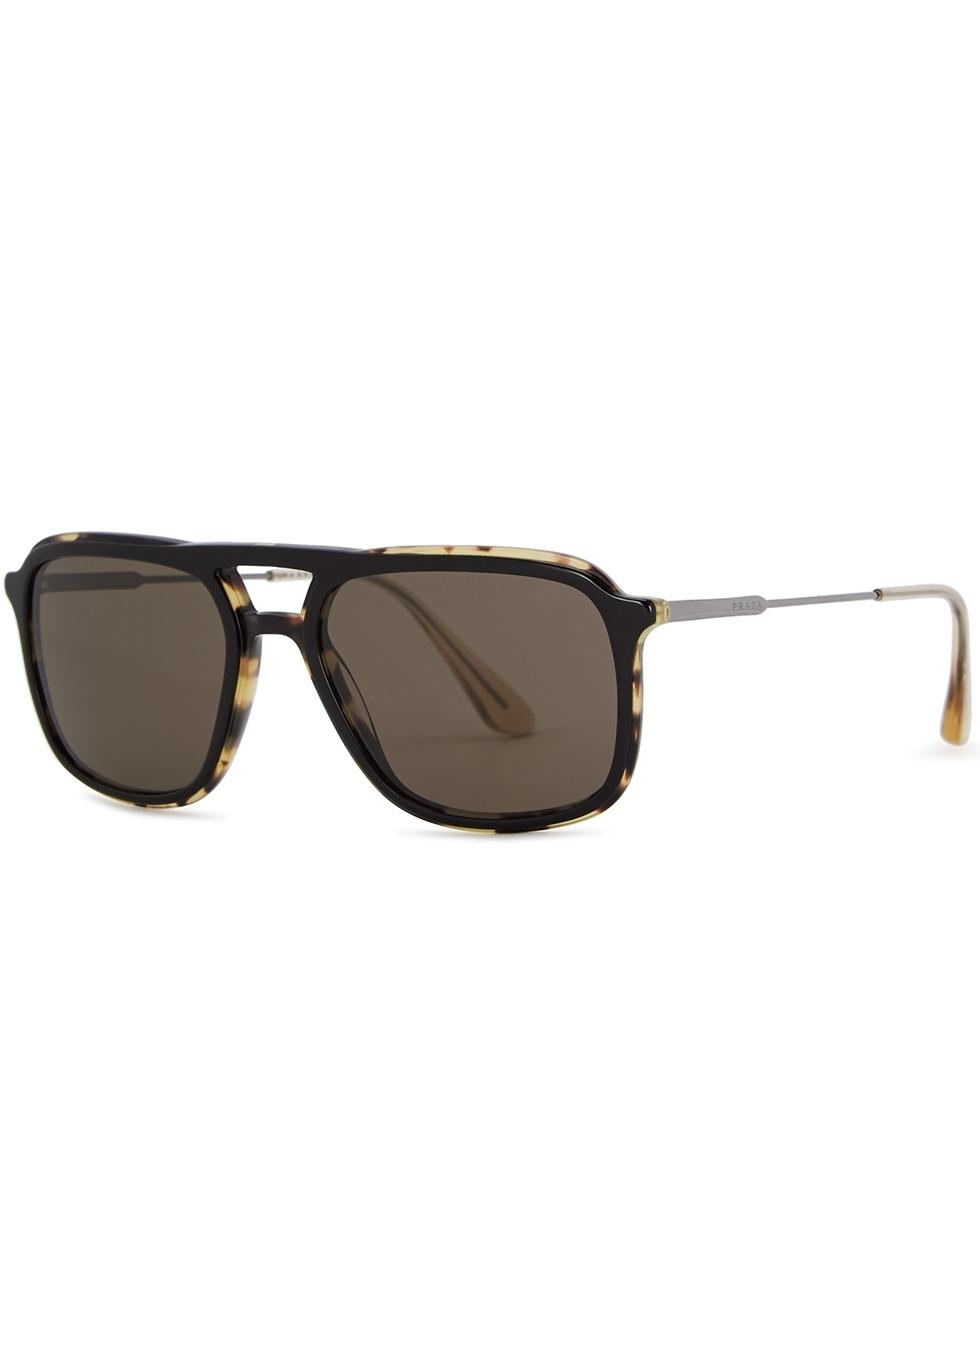 48774692ae60 Women s Designer Sunglasses and Eyewear - Harvey Nichols